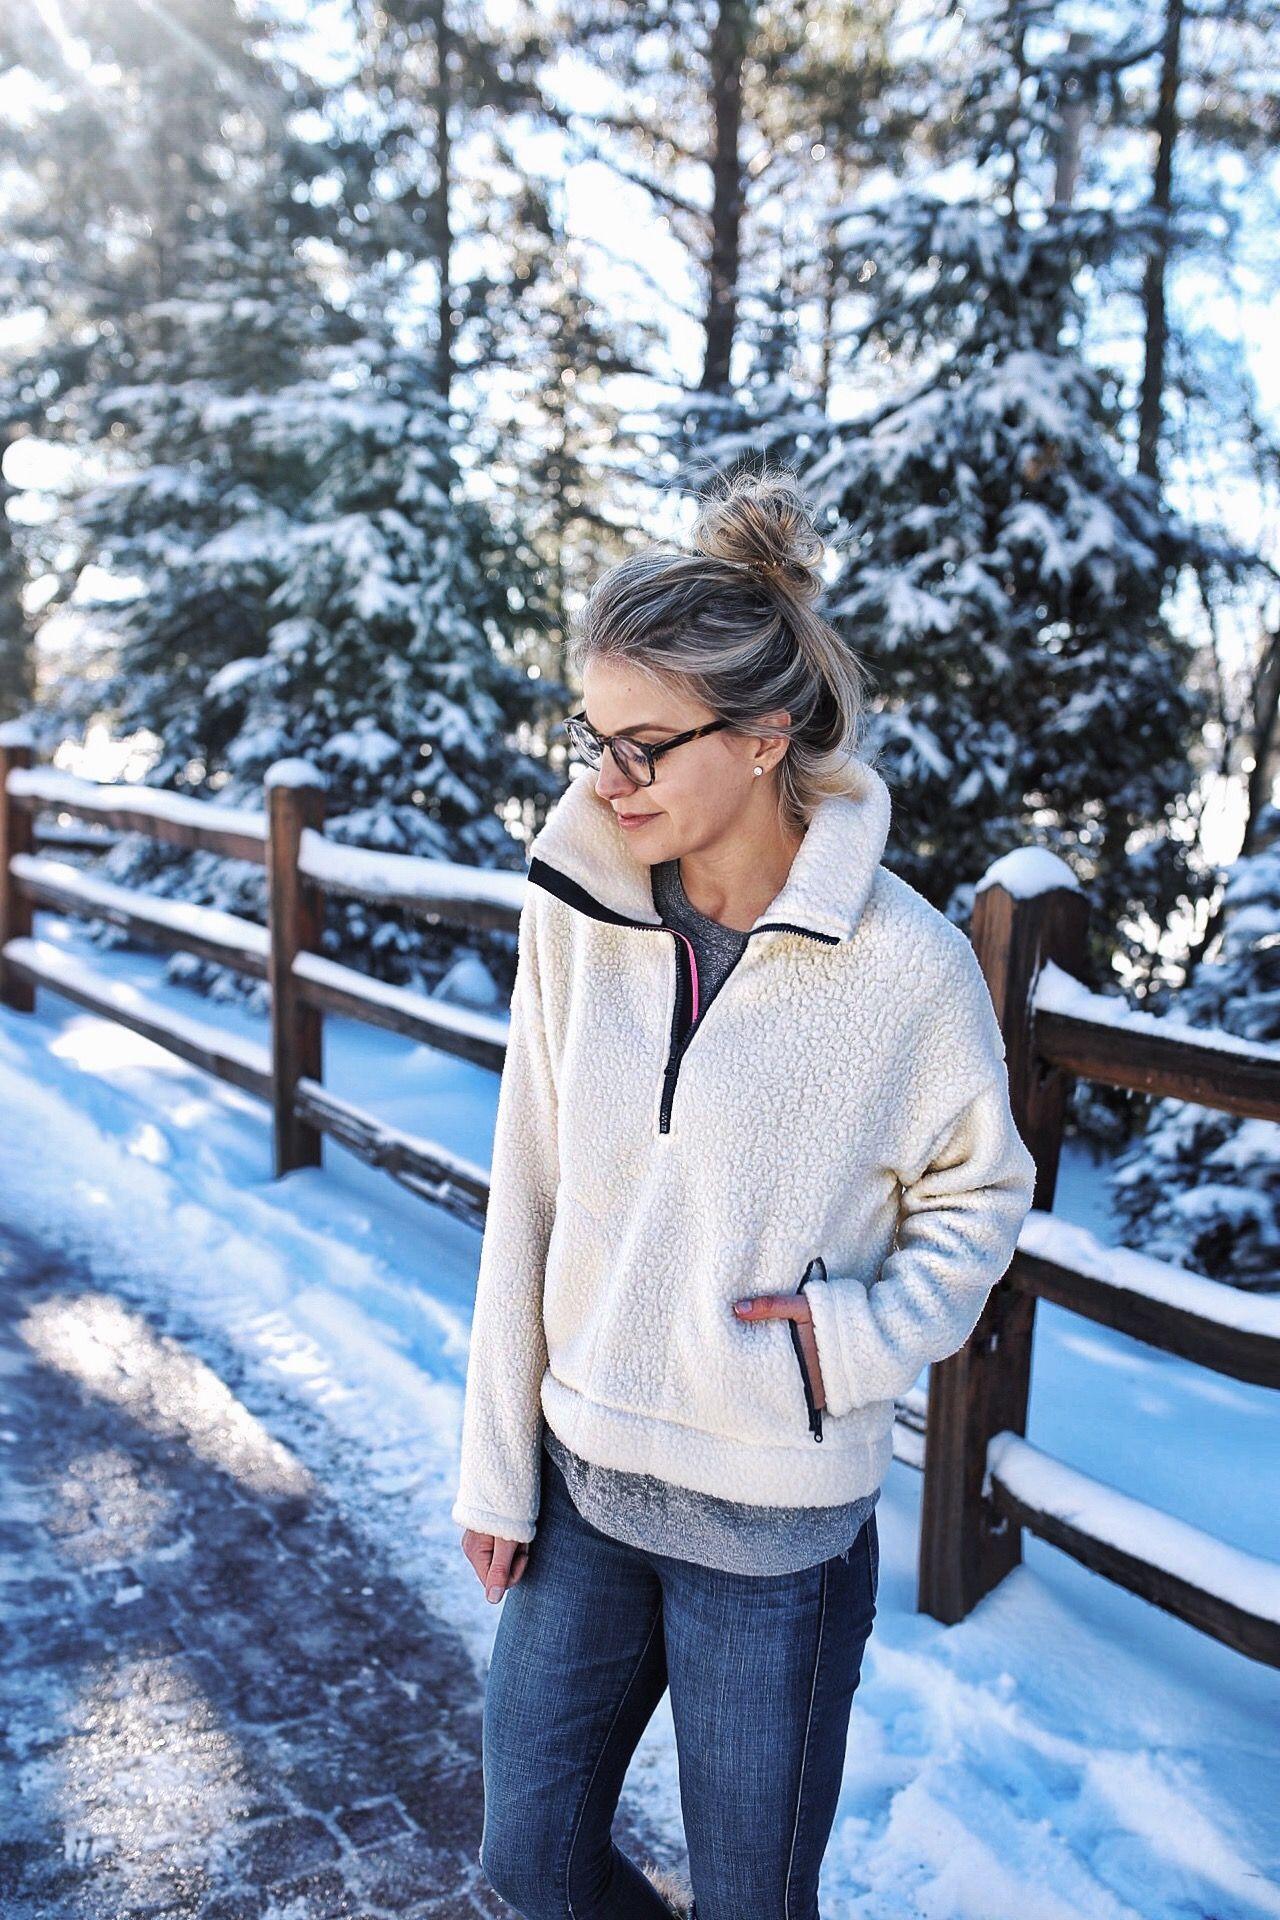 Lake Placid Snaps What To Wear For Winter Pinterest Austin Wedges Stormin Beige 37 Half Zip Sweatshirt In Polartec Fleece